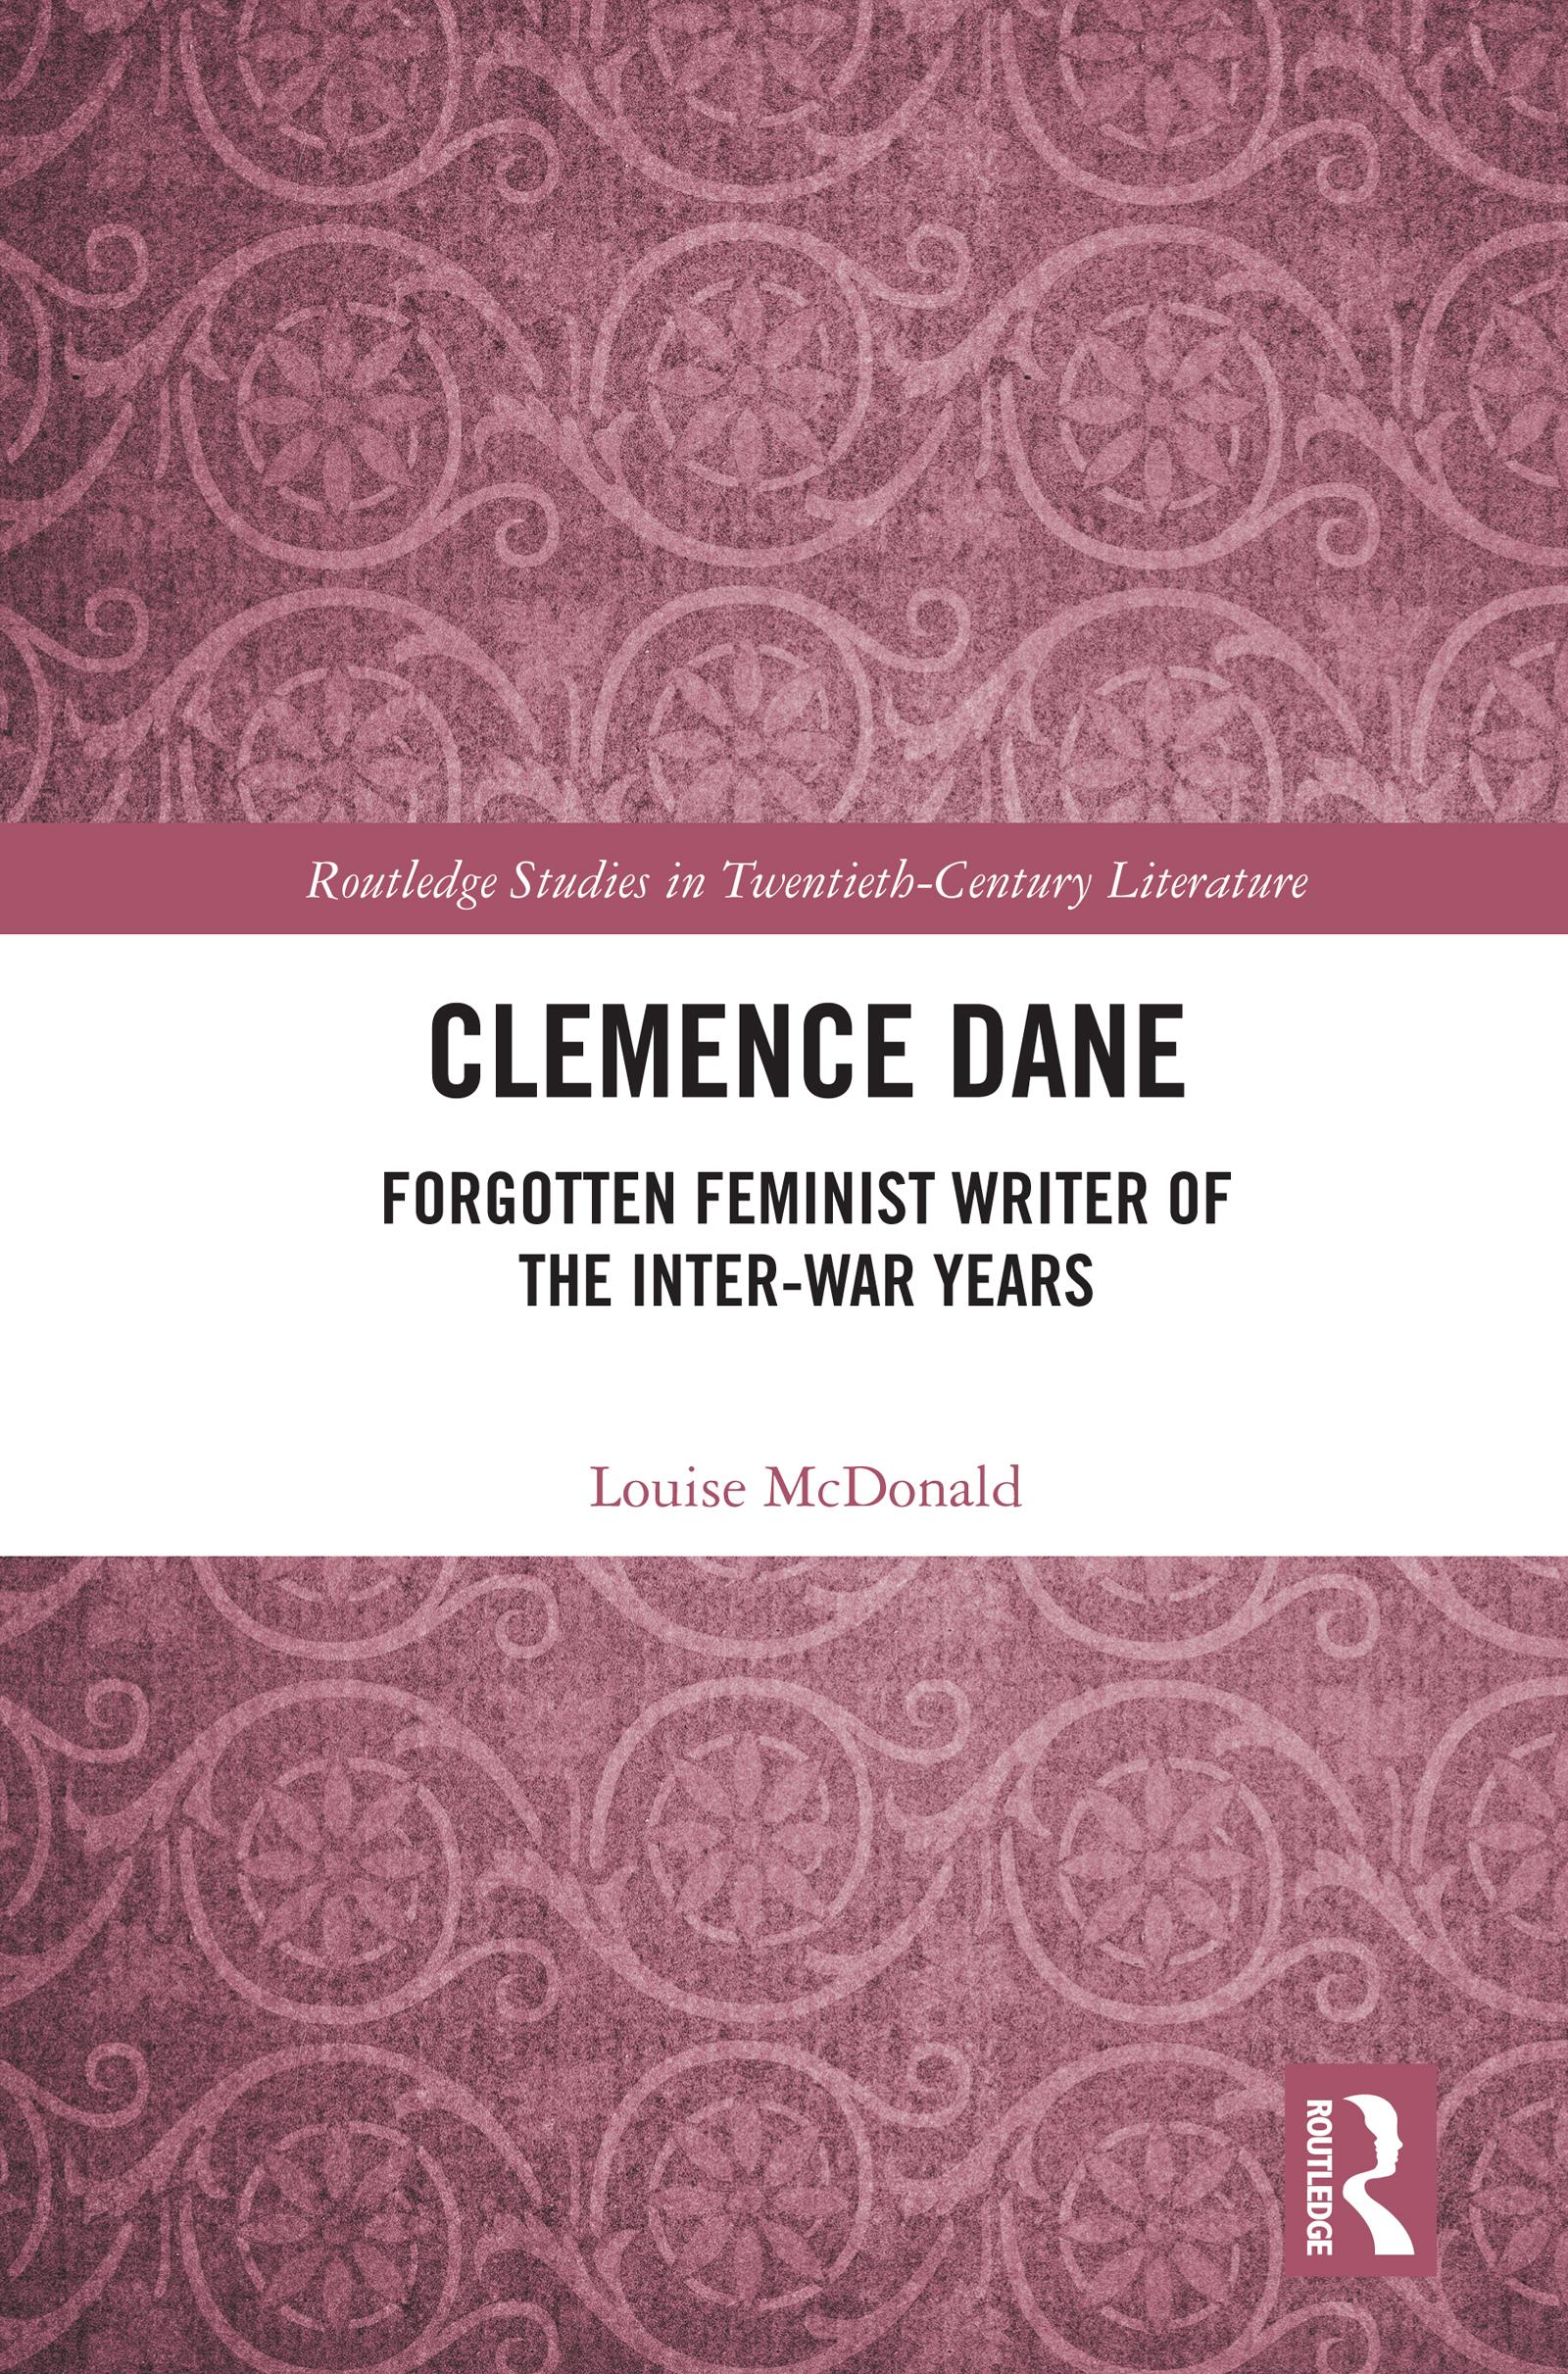 Clemence Dane